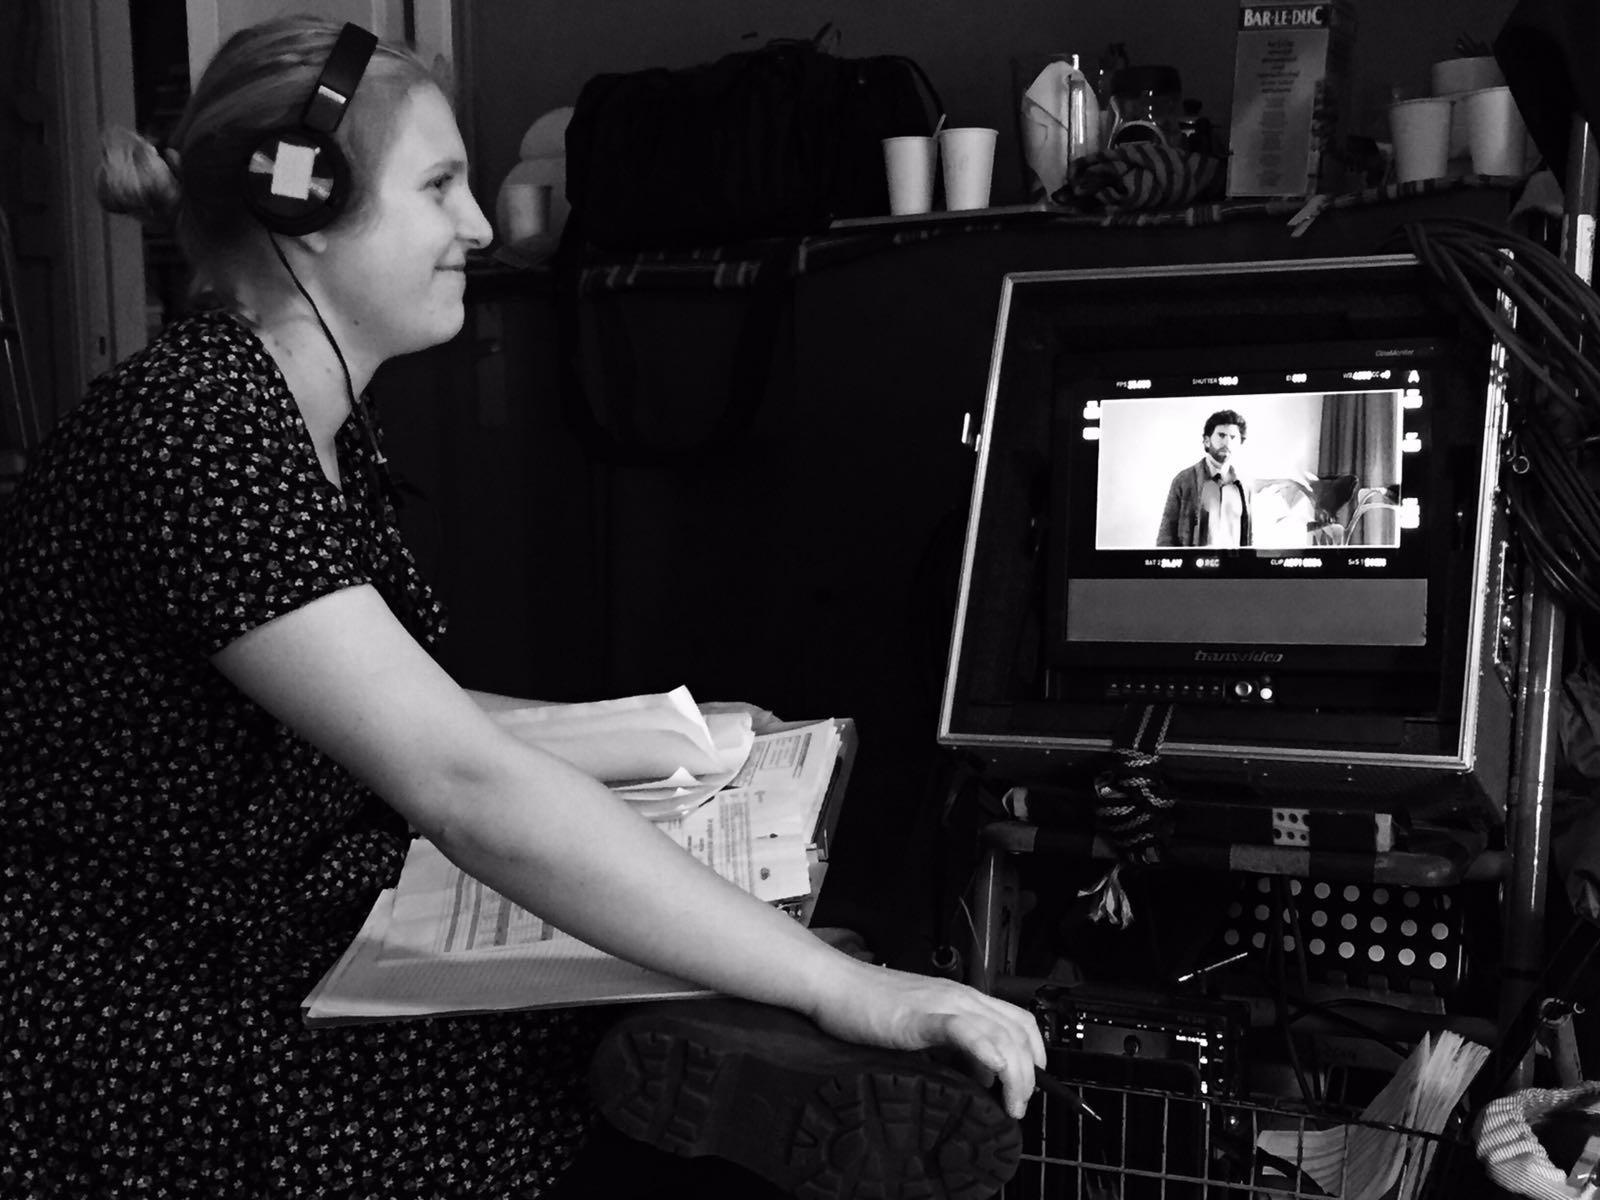 Regie assistent